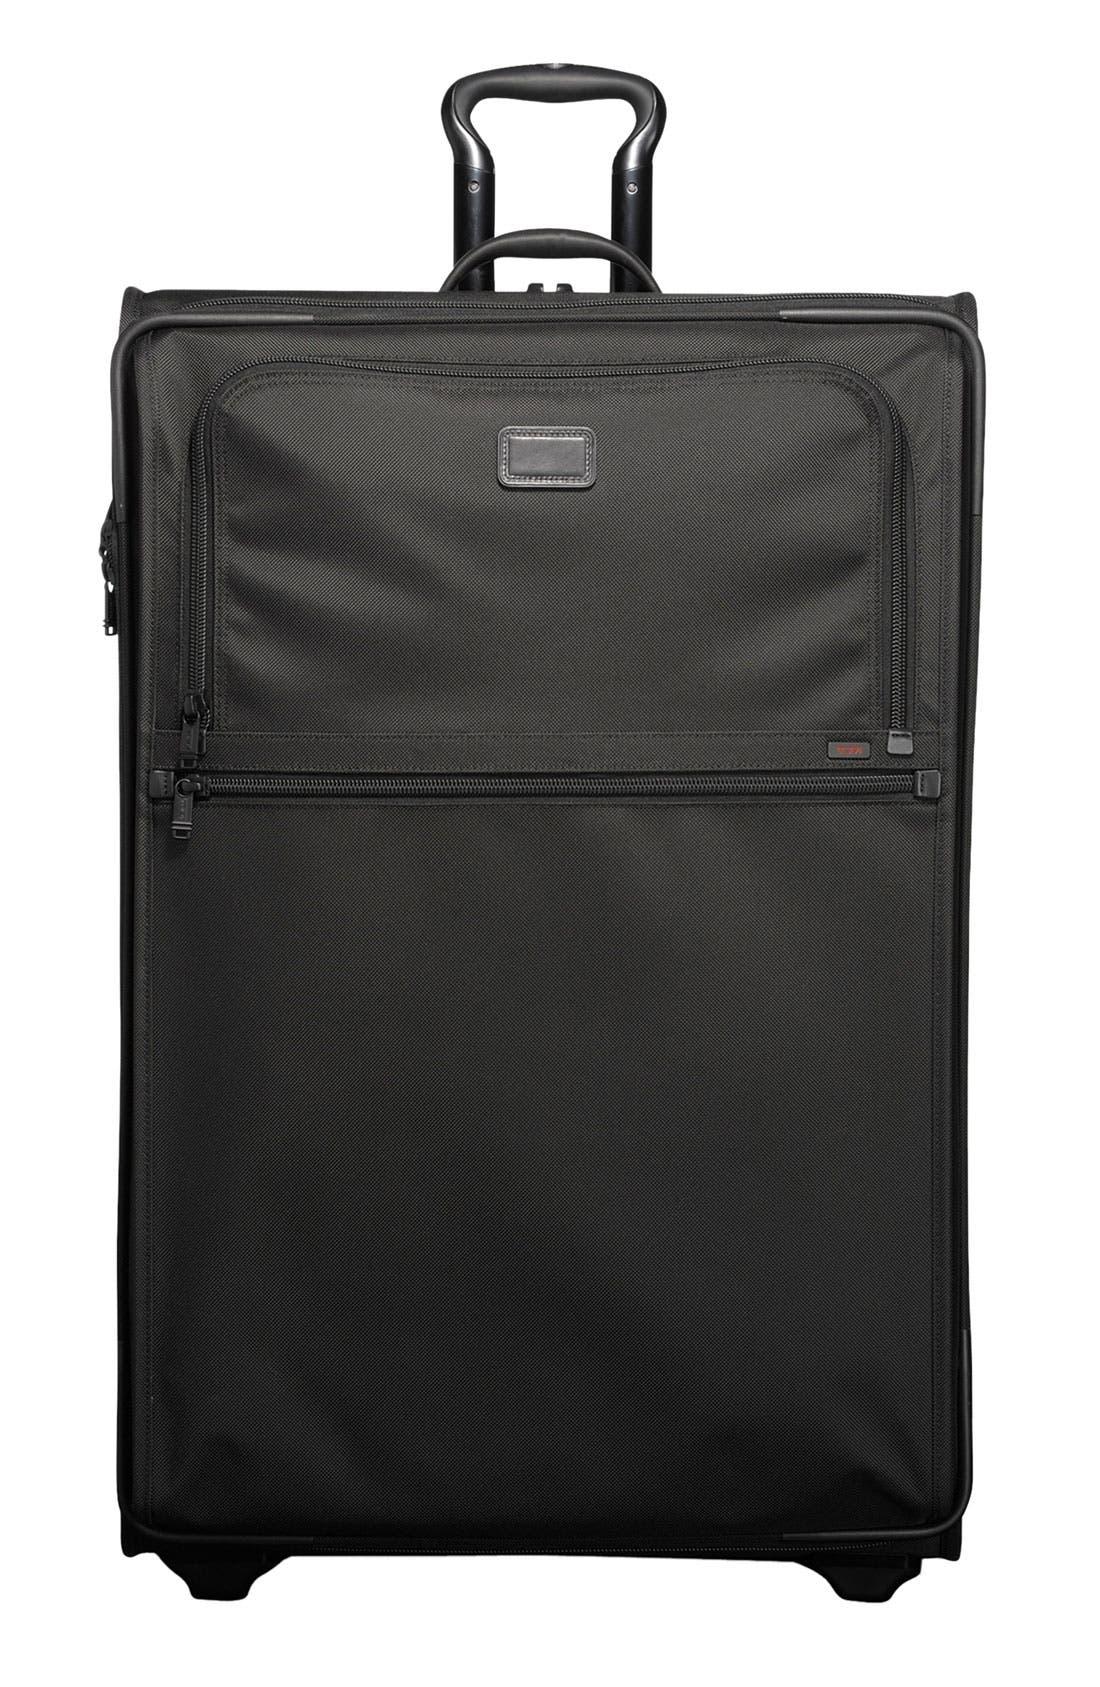 Alternate Image 1 Selected - Tumi 'Alpha' Wheeled Expandable Woldwide Trip Bag